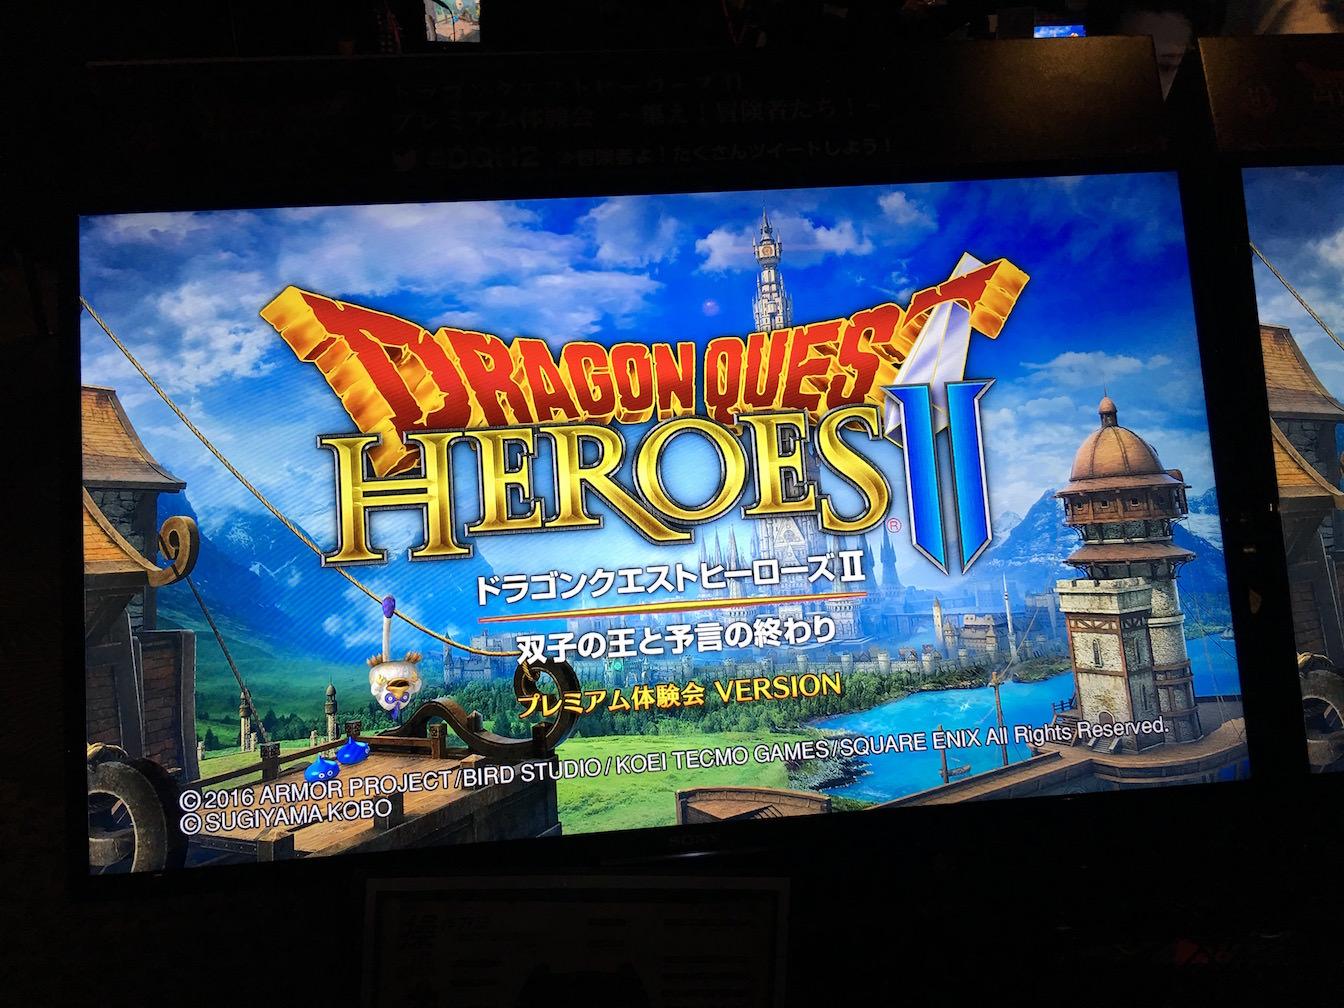 Dragon quest heros 2 premium experience meeting report 17